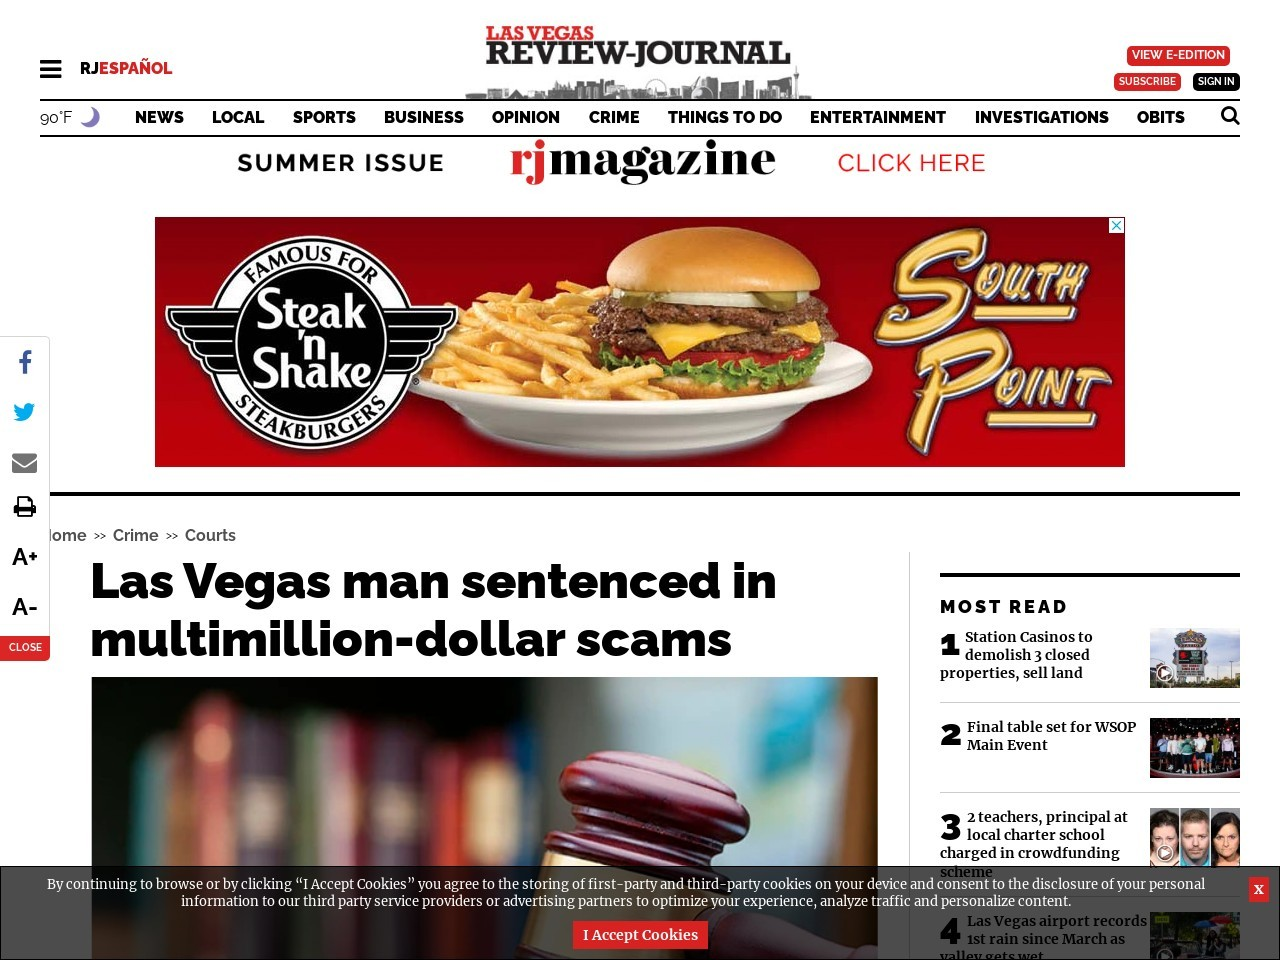 Las Vegas man sentenced in multimillion-dollar scams